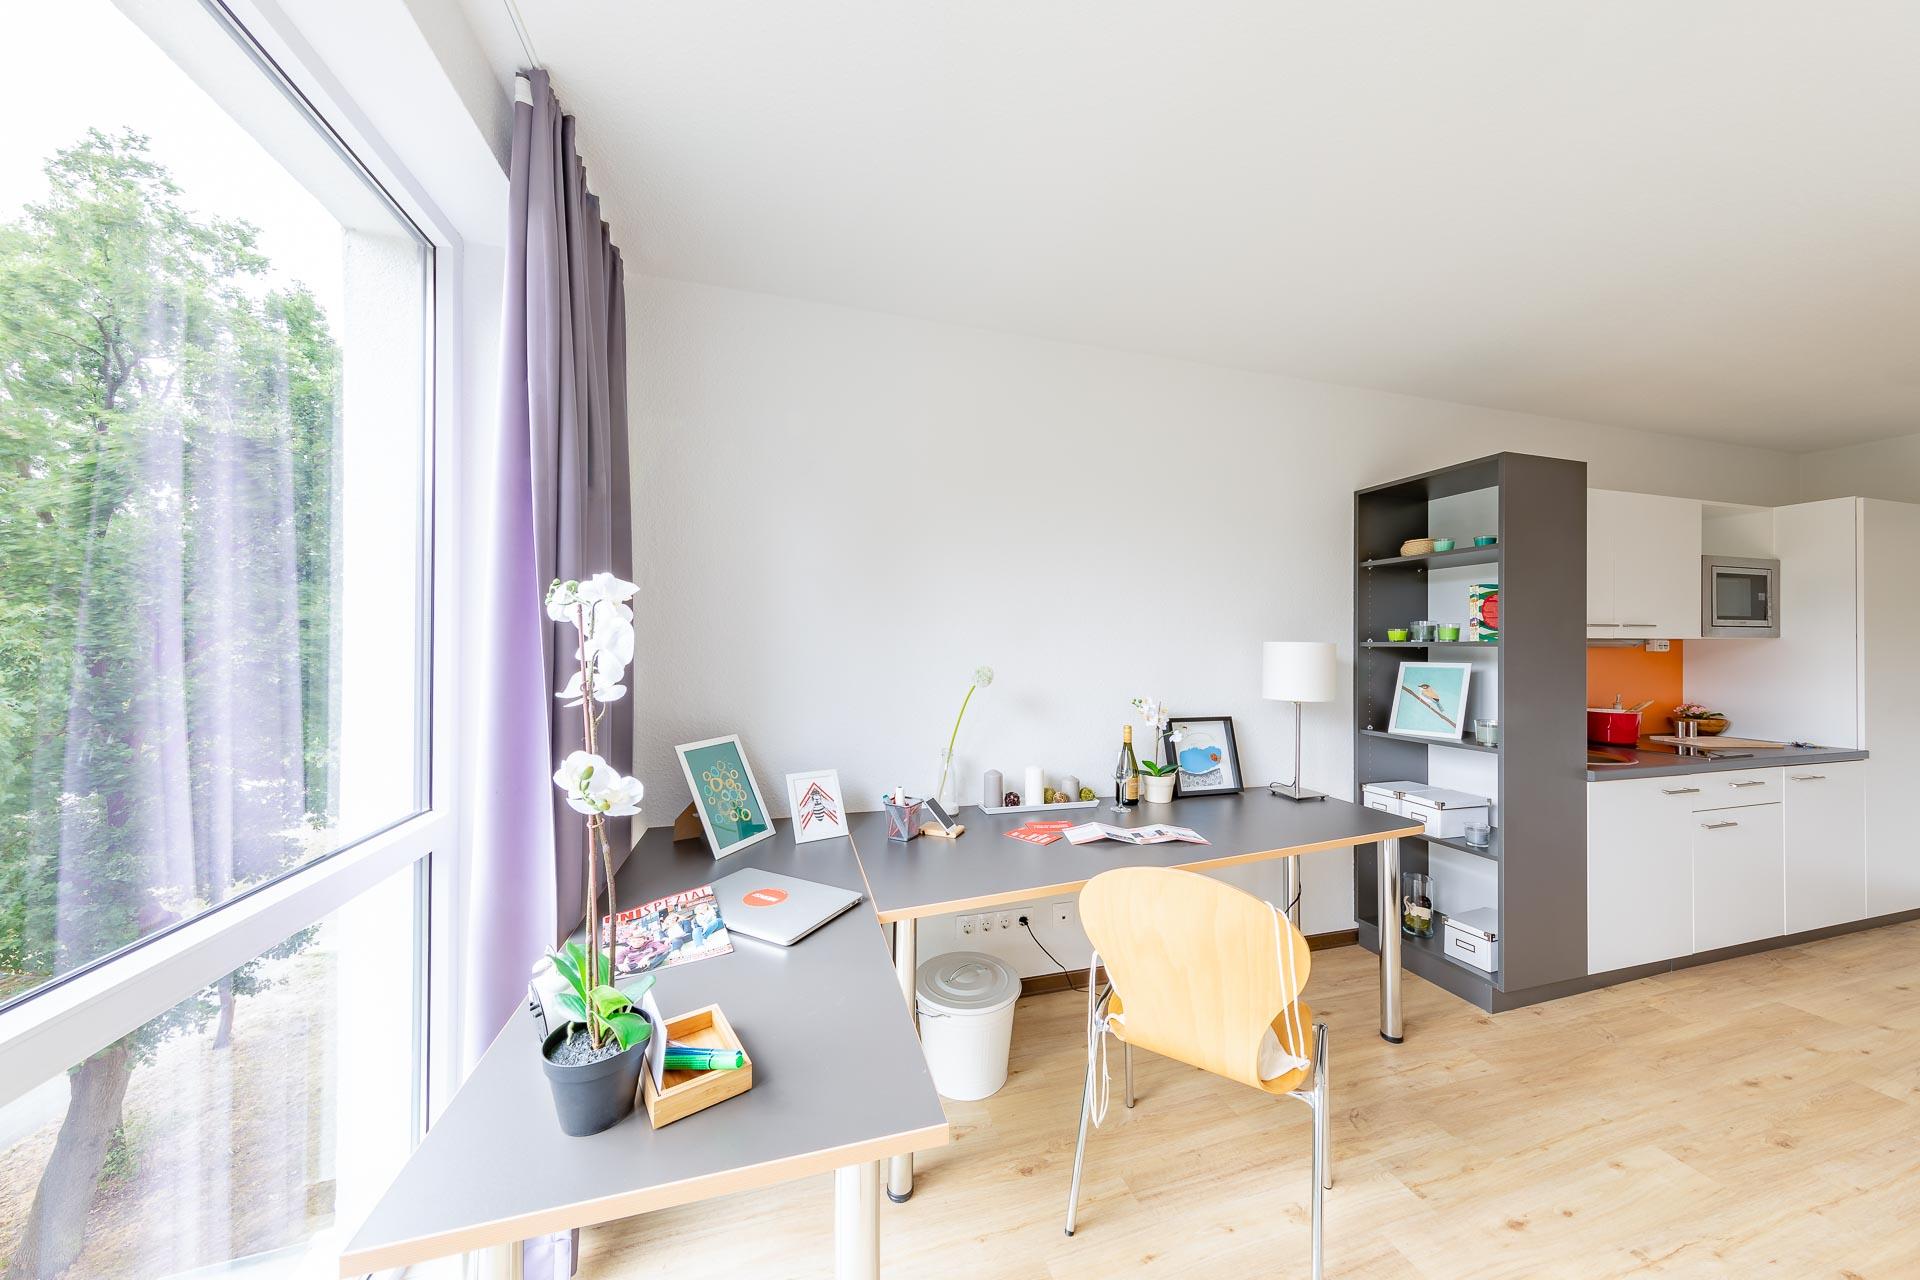 THE FIZZ Bremen Small Apartment - Arbeitsbereich